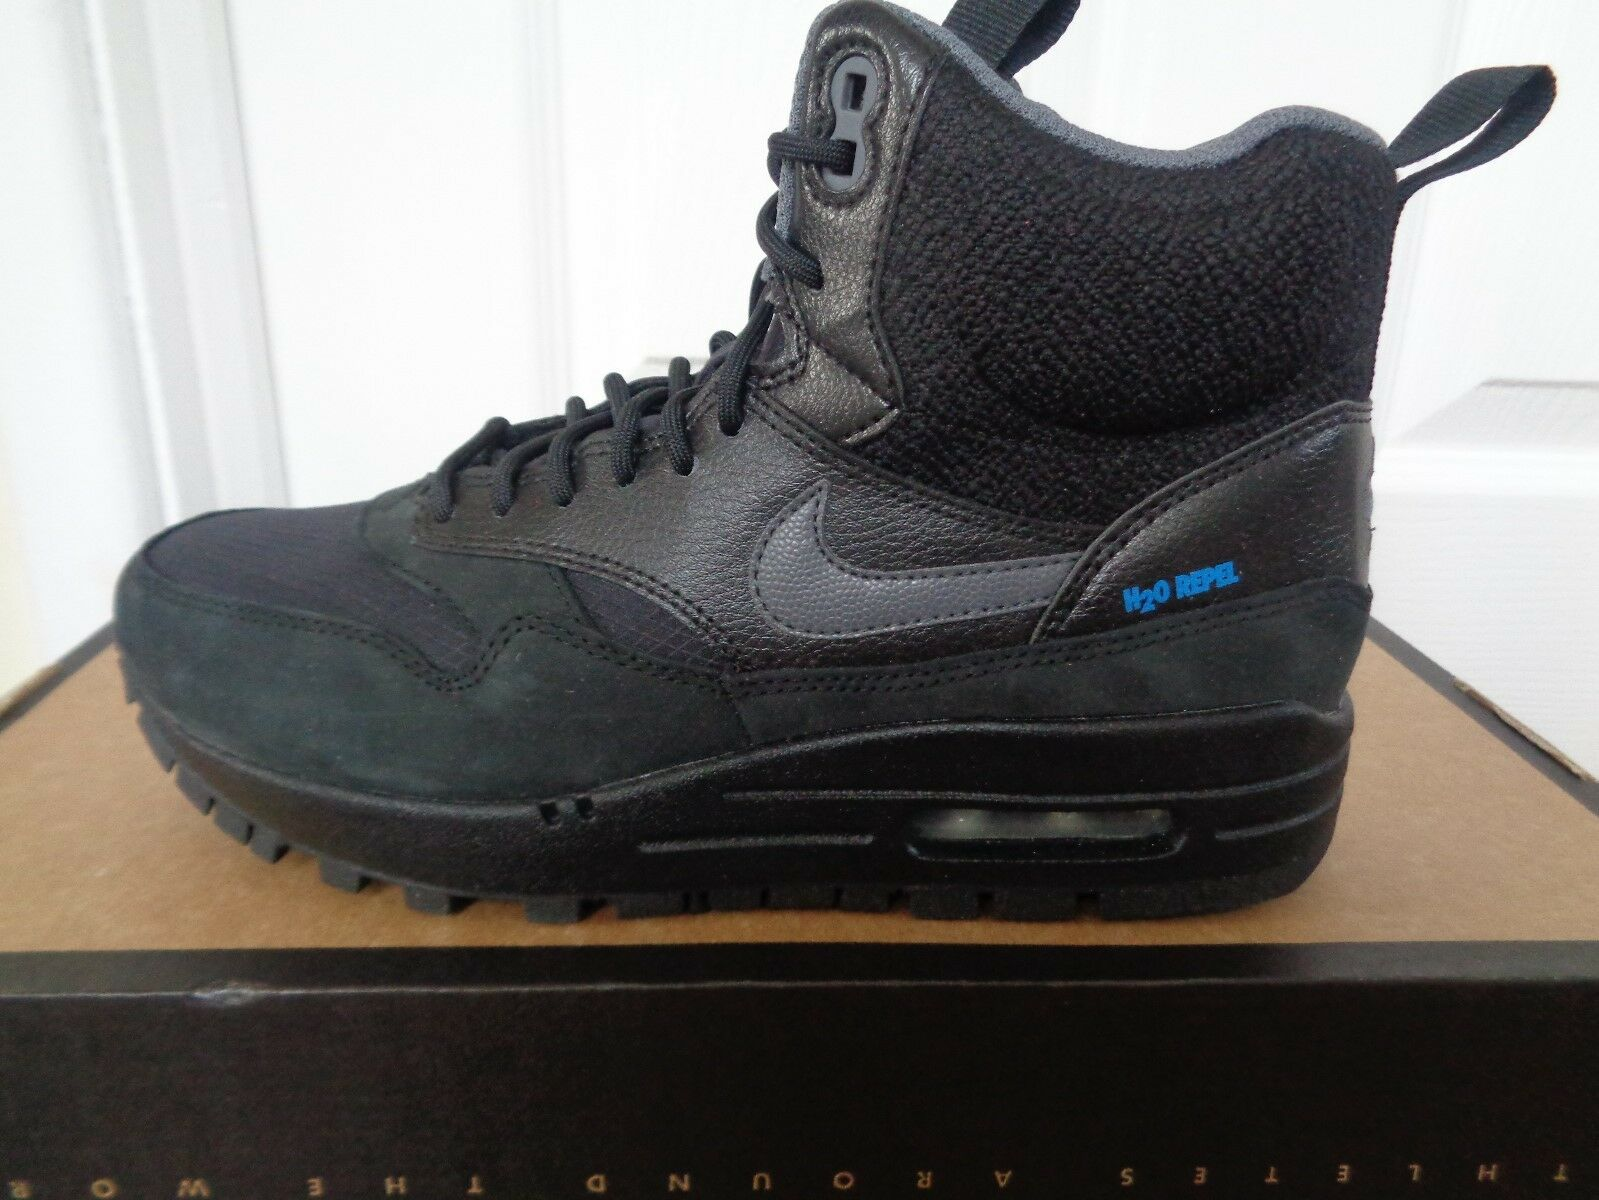 Nike Da Donna Air Max 1 ginnastica Mid Sneakerboot Scarpe da ginnastica 1 685267 001 NUOVI 2f0136